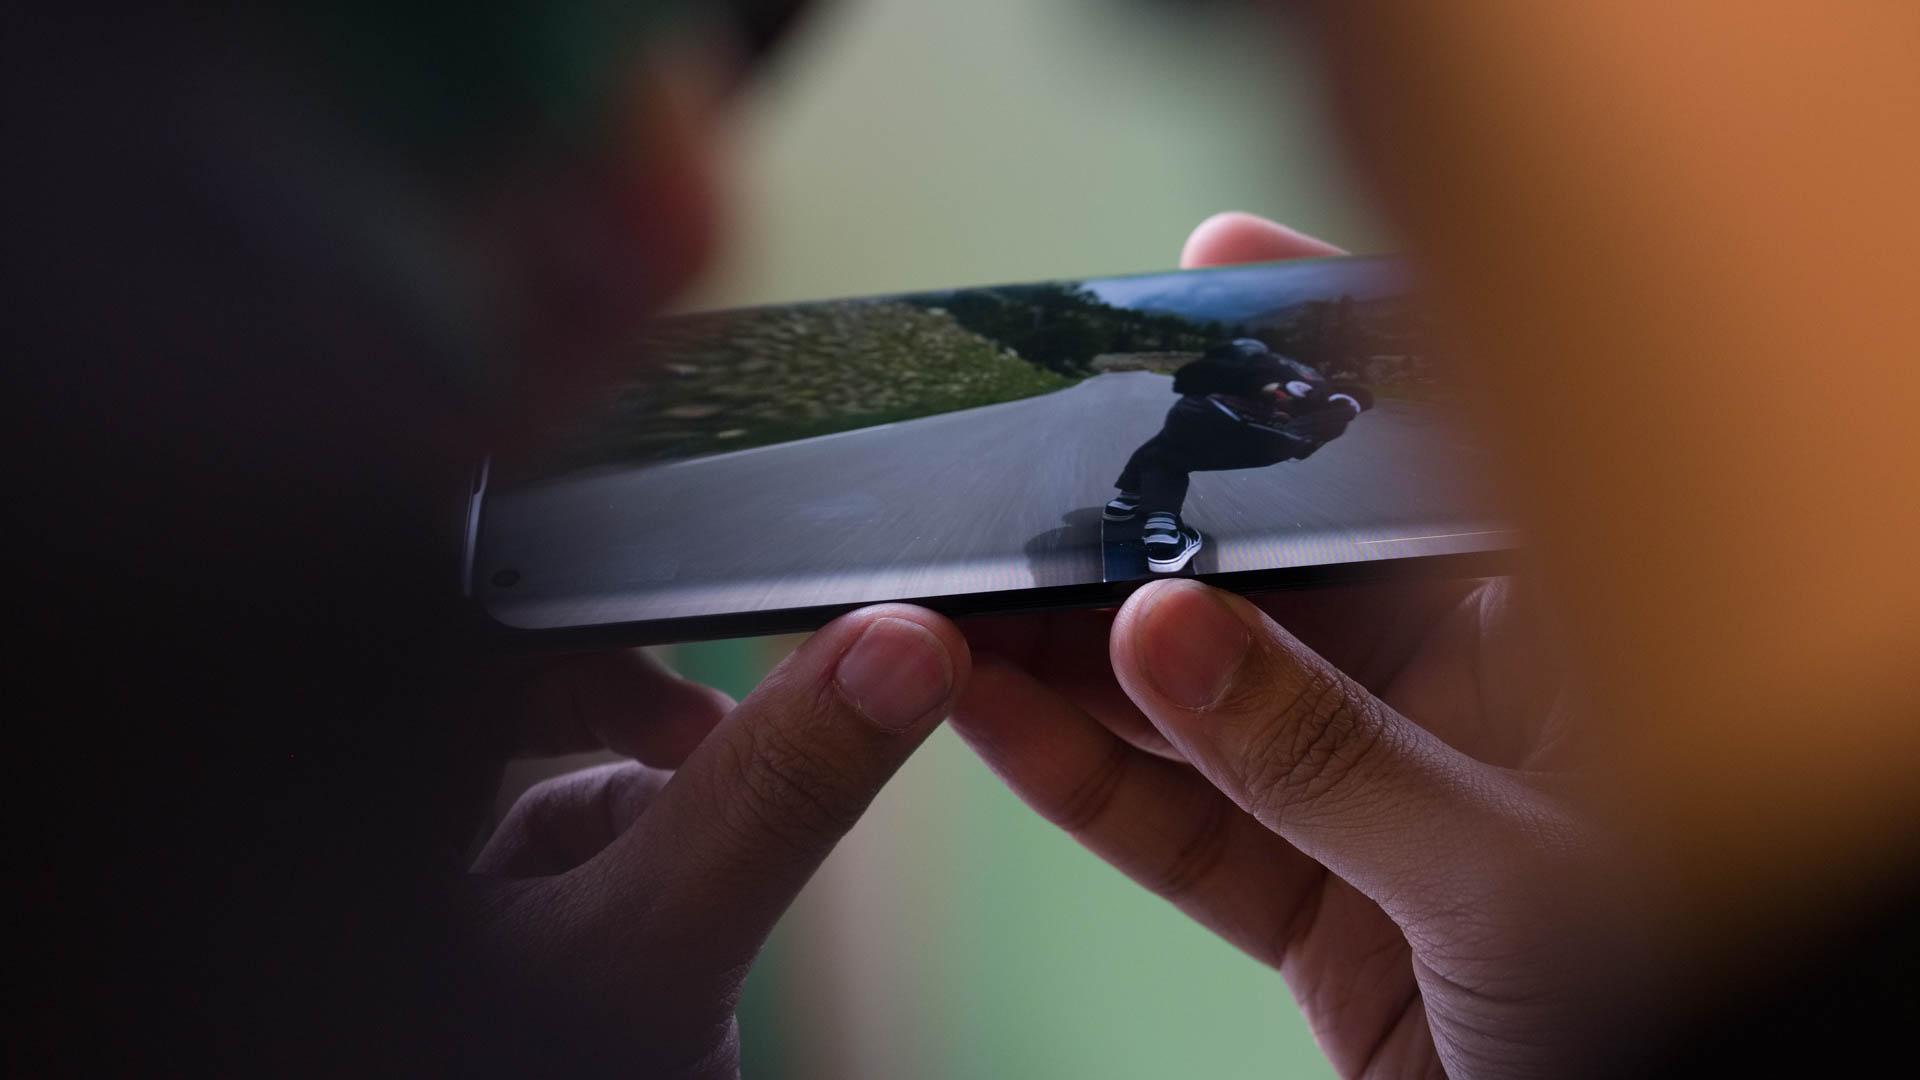 Motorola Edge edge of display